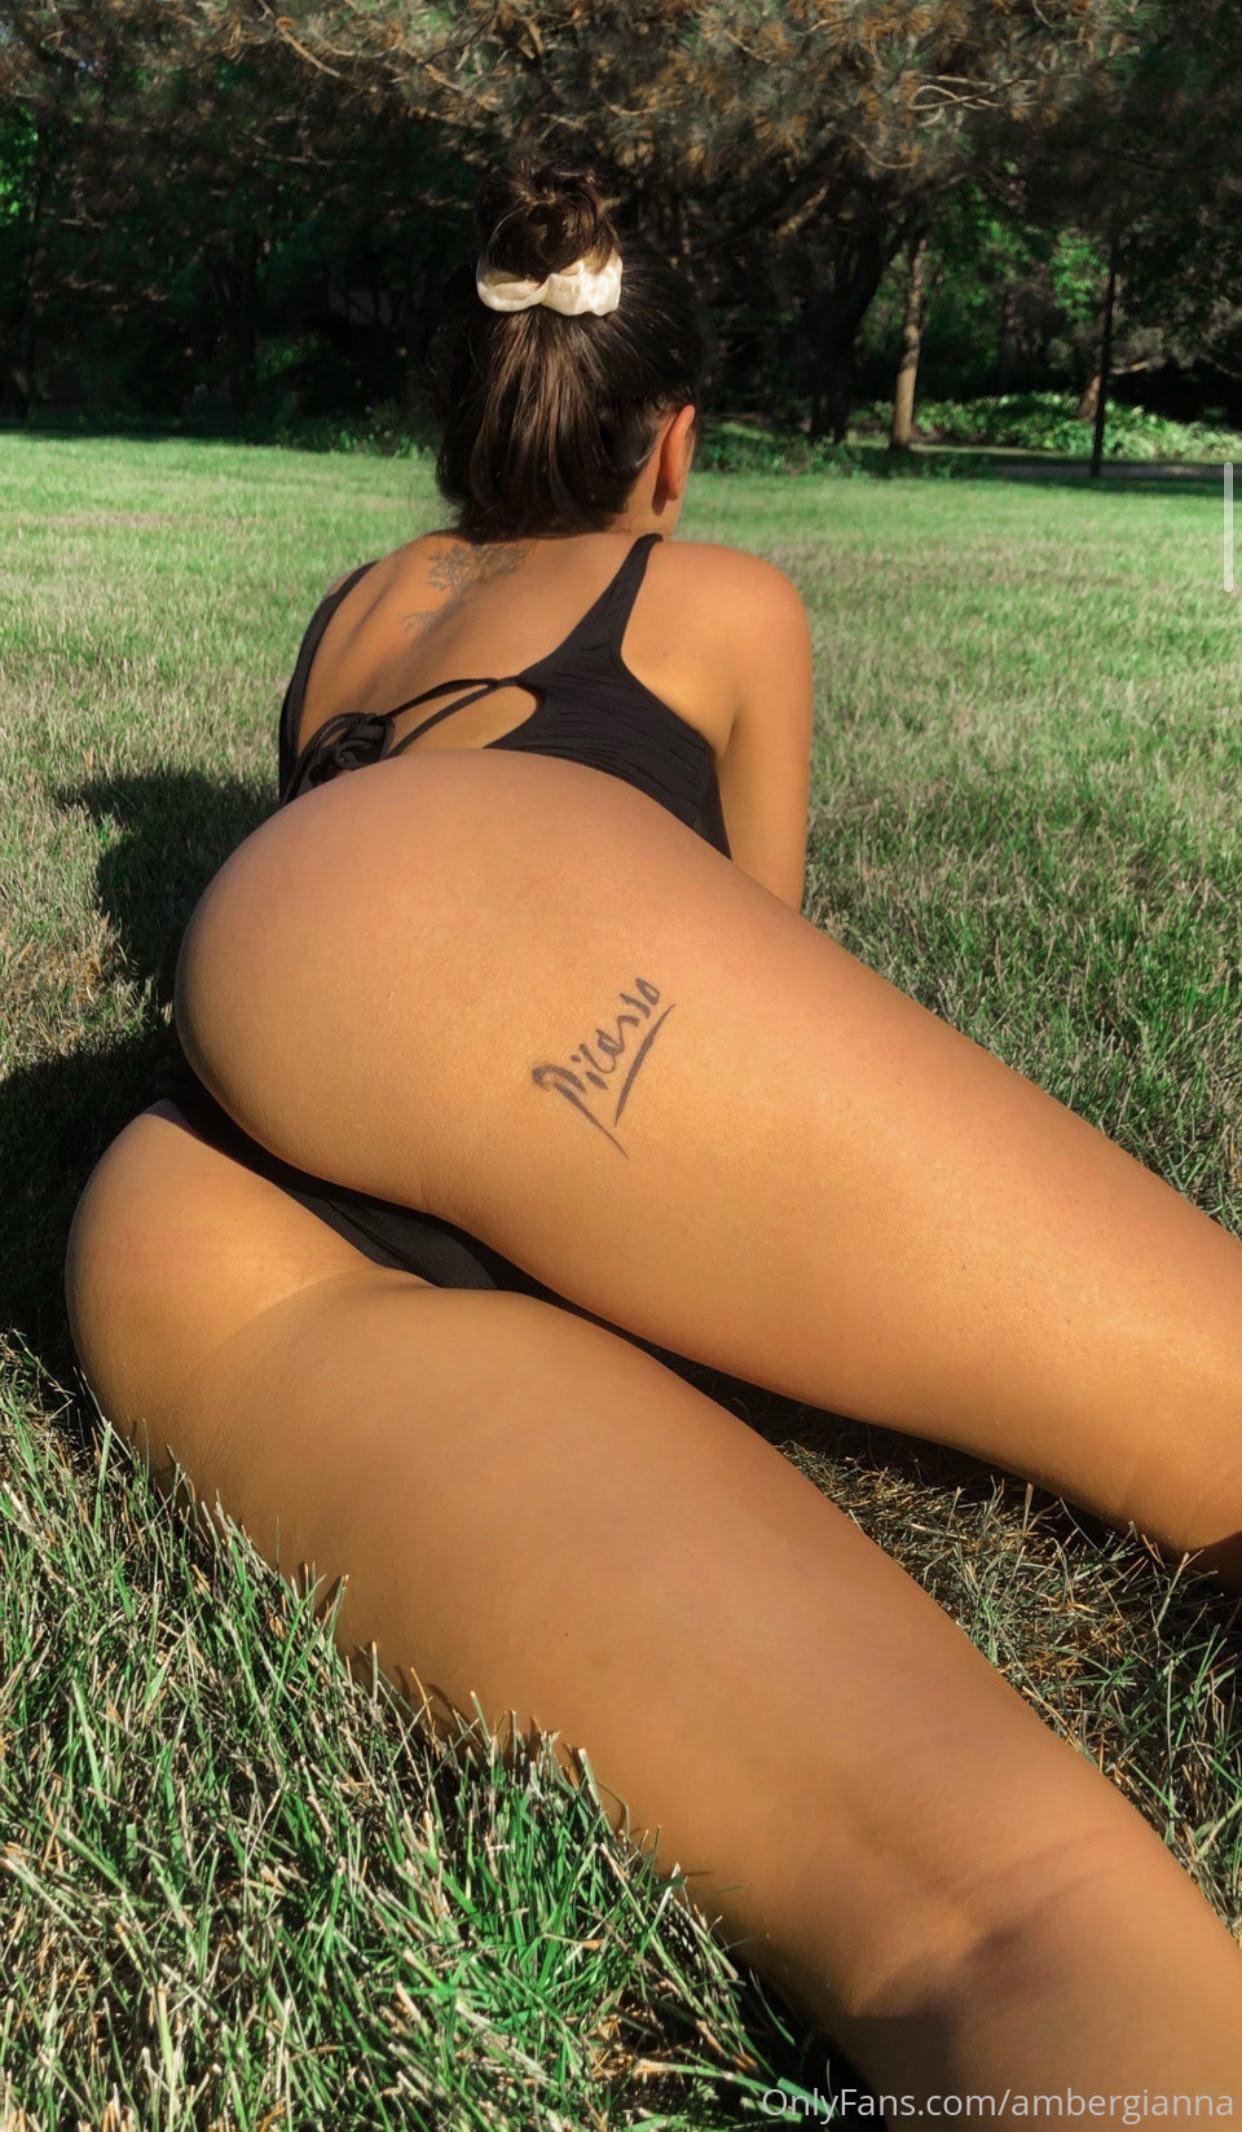 Amber Gianna Leaked 0052